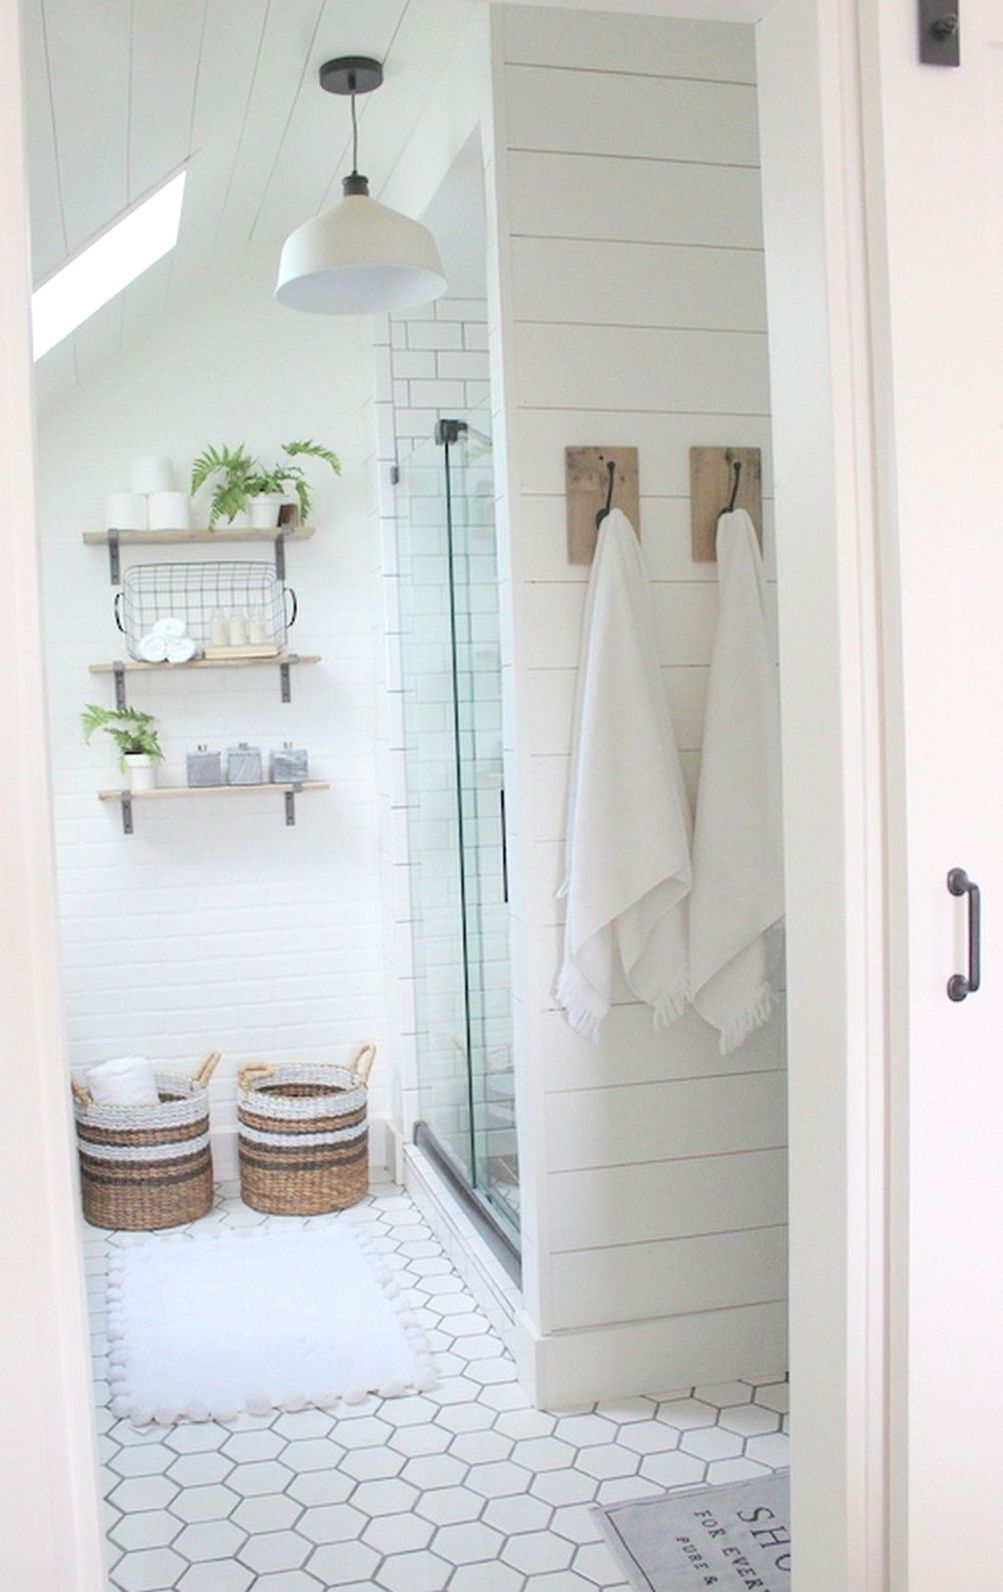 remodeling bathroom ideas | House | Pinterest | Bathroom laundry ...